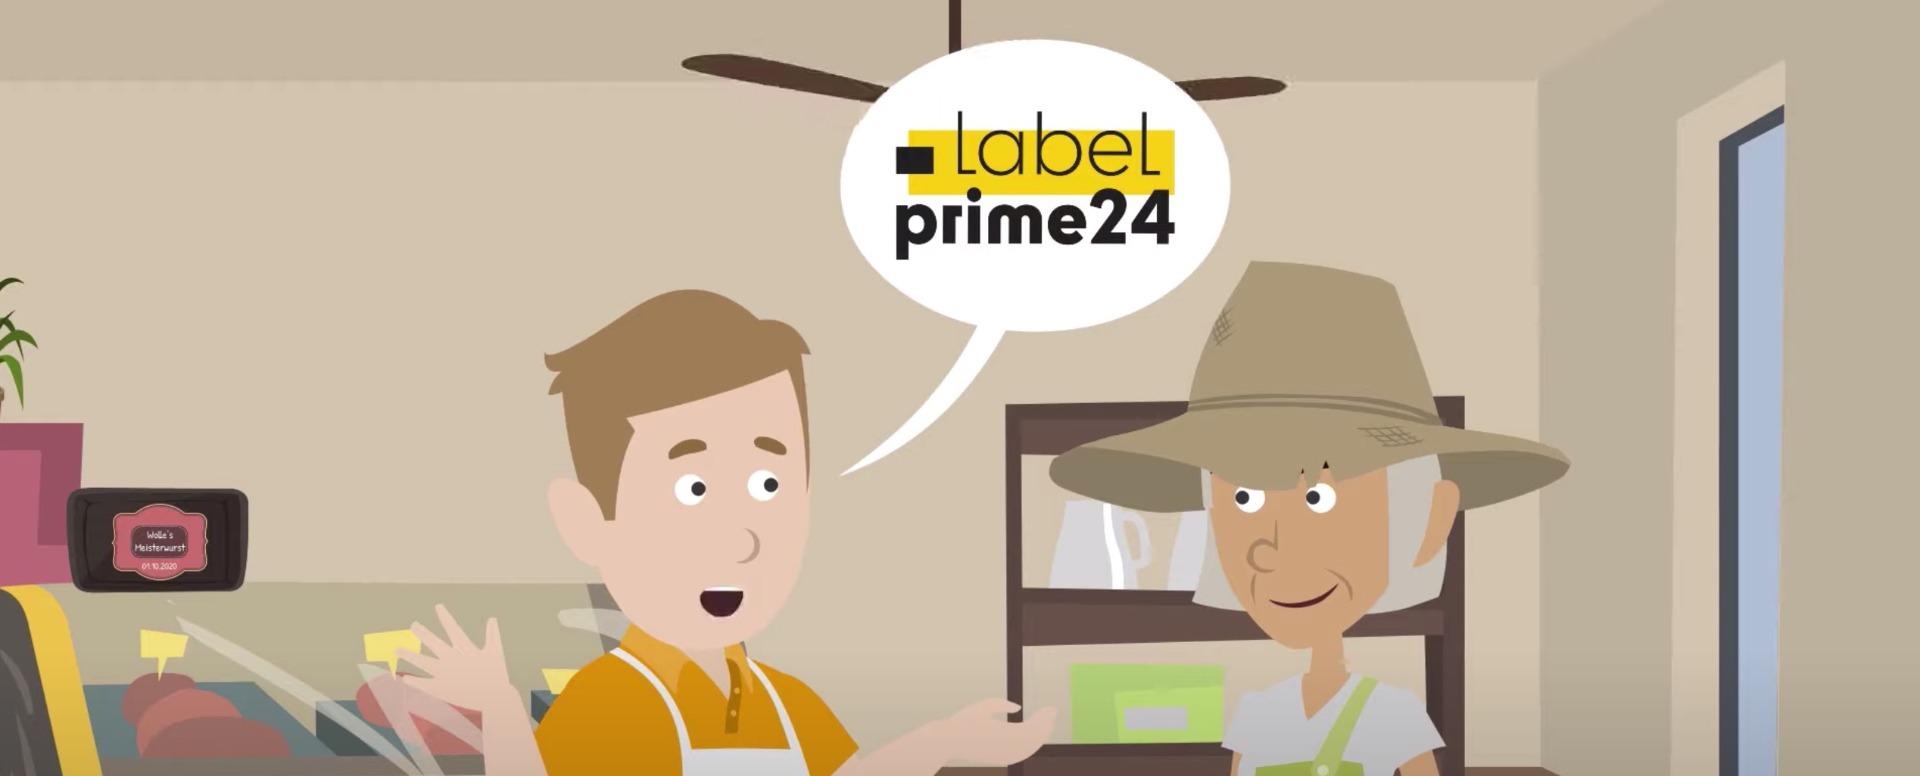 LabelPrime24 kurz erklärt auf YouTube